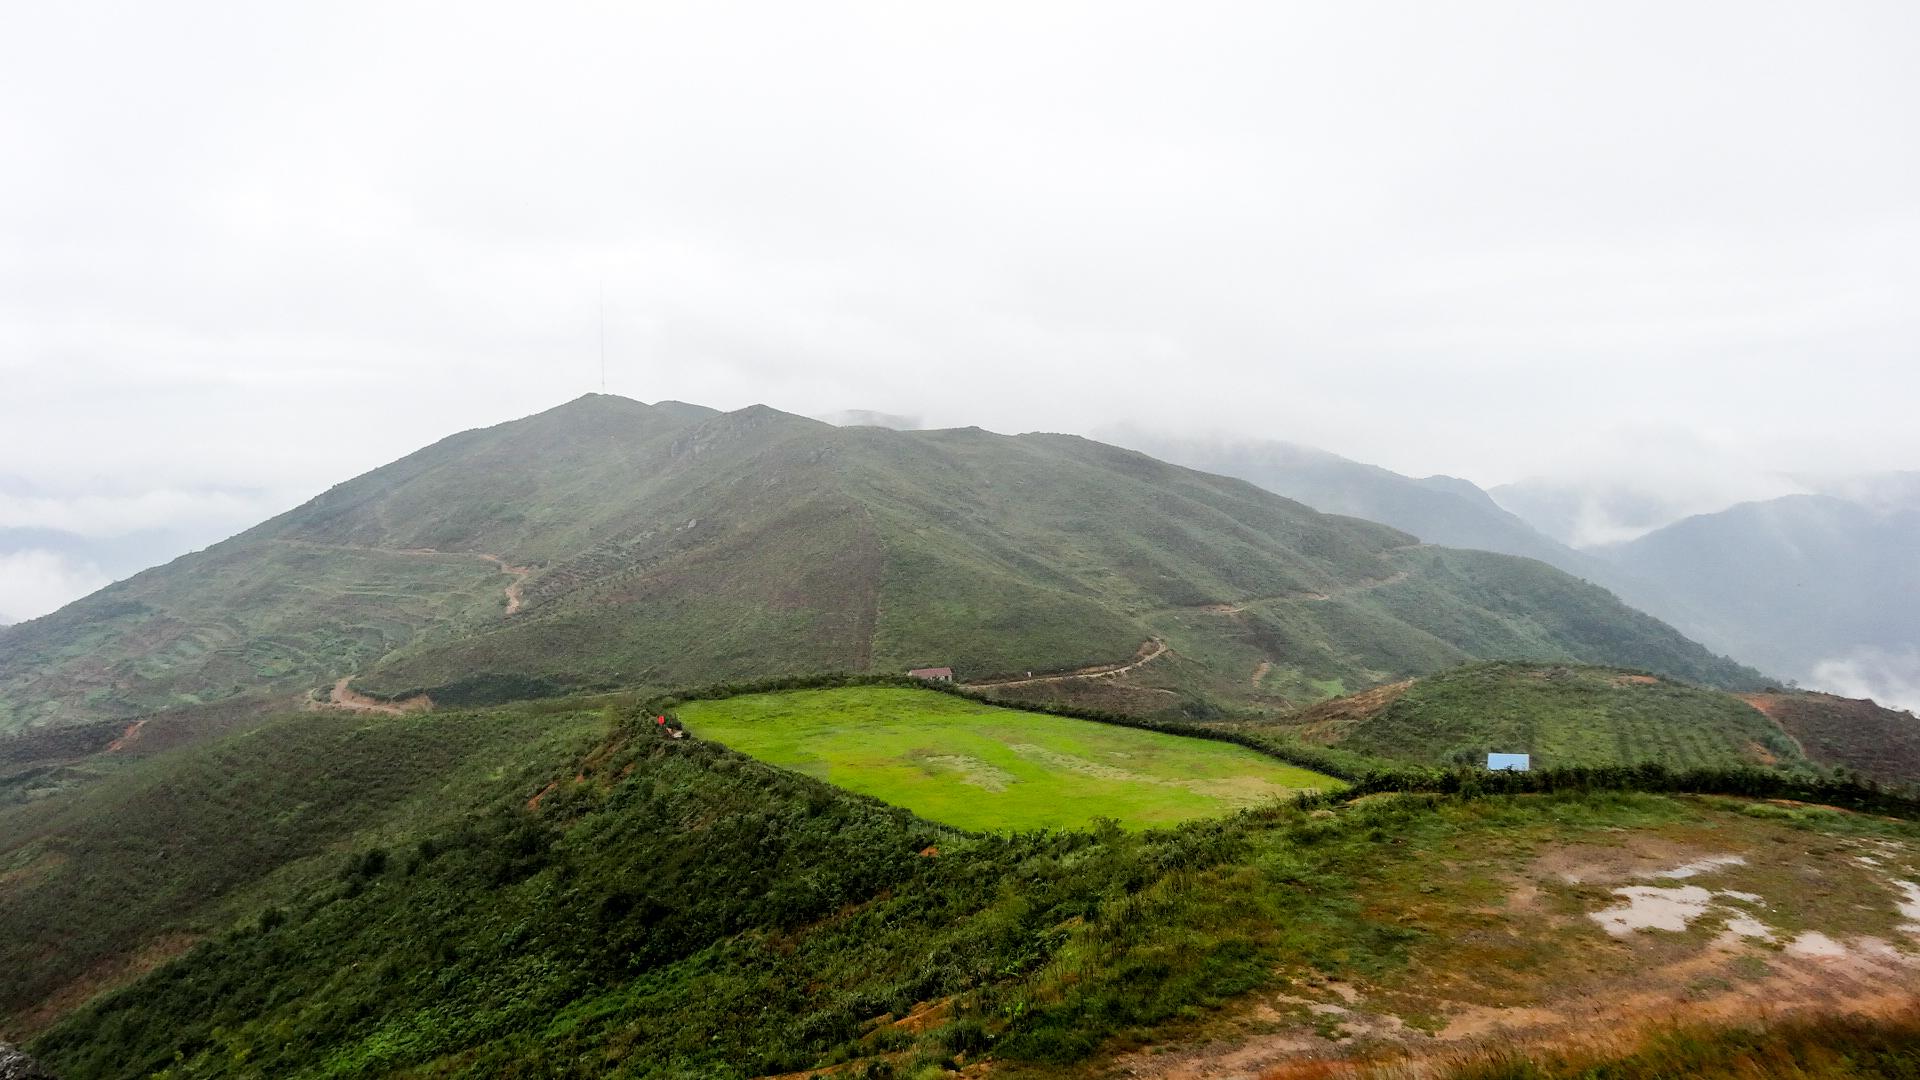 Fuzhi Mountain Scenic Area